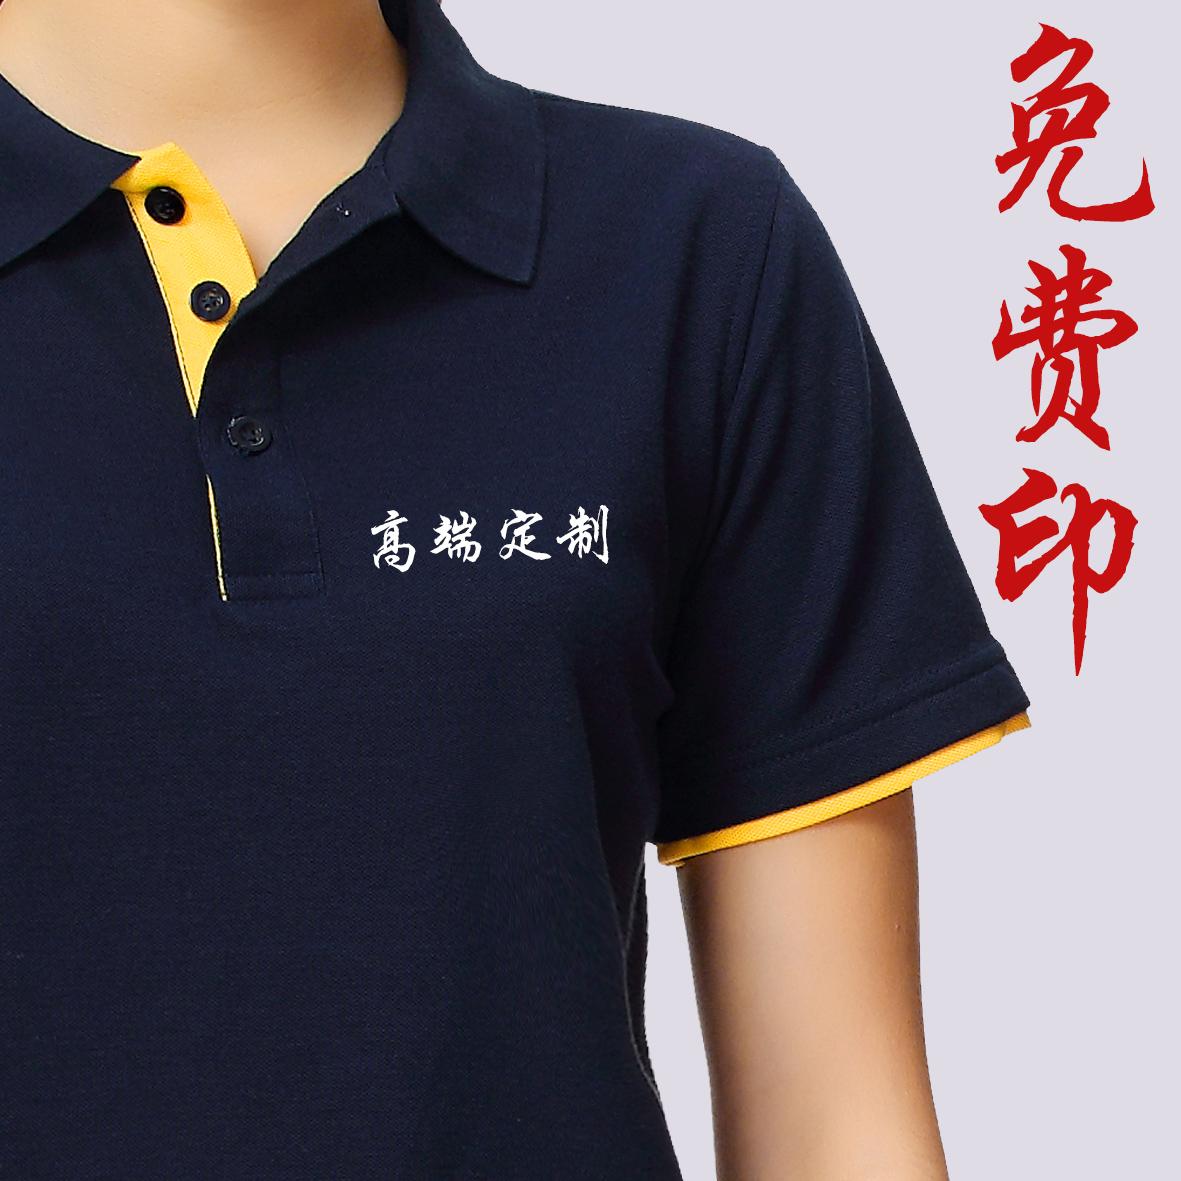 Usd 2723 Polo Shirt Custom T Shirt Corporate Group Party Short